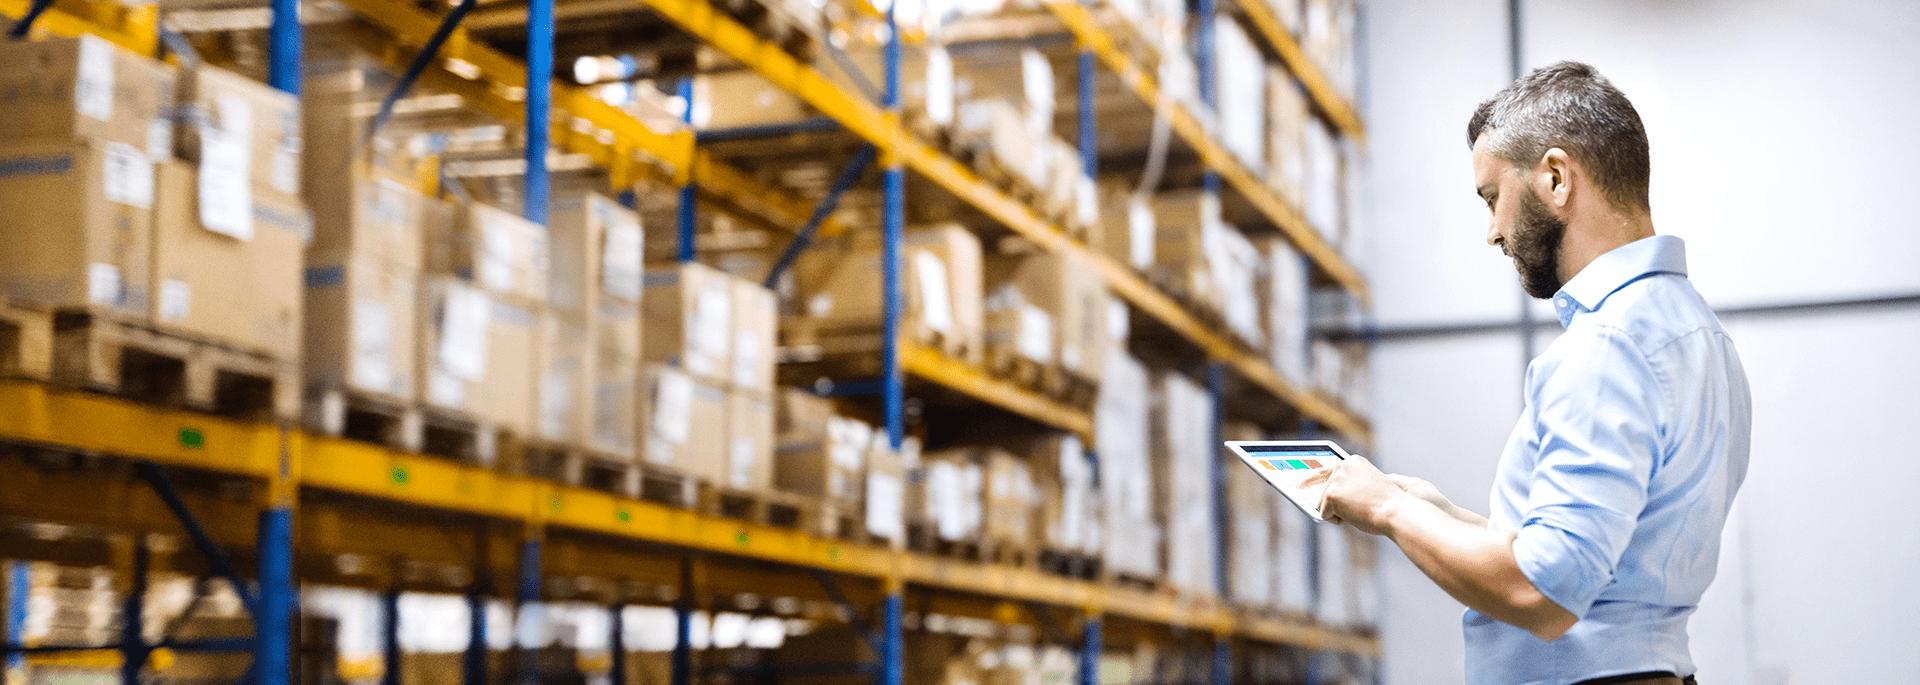 Successive Logistics & Distribution